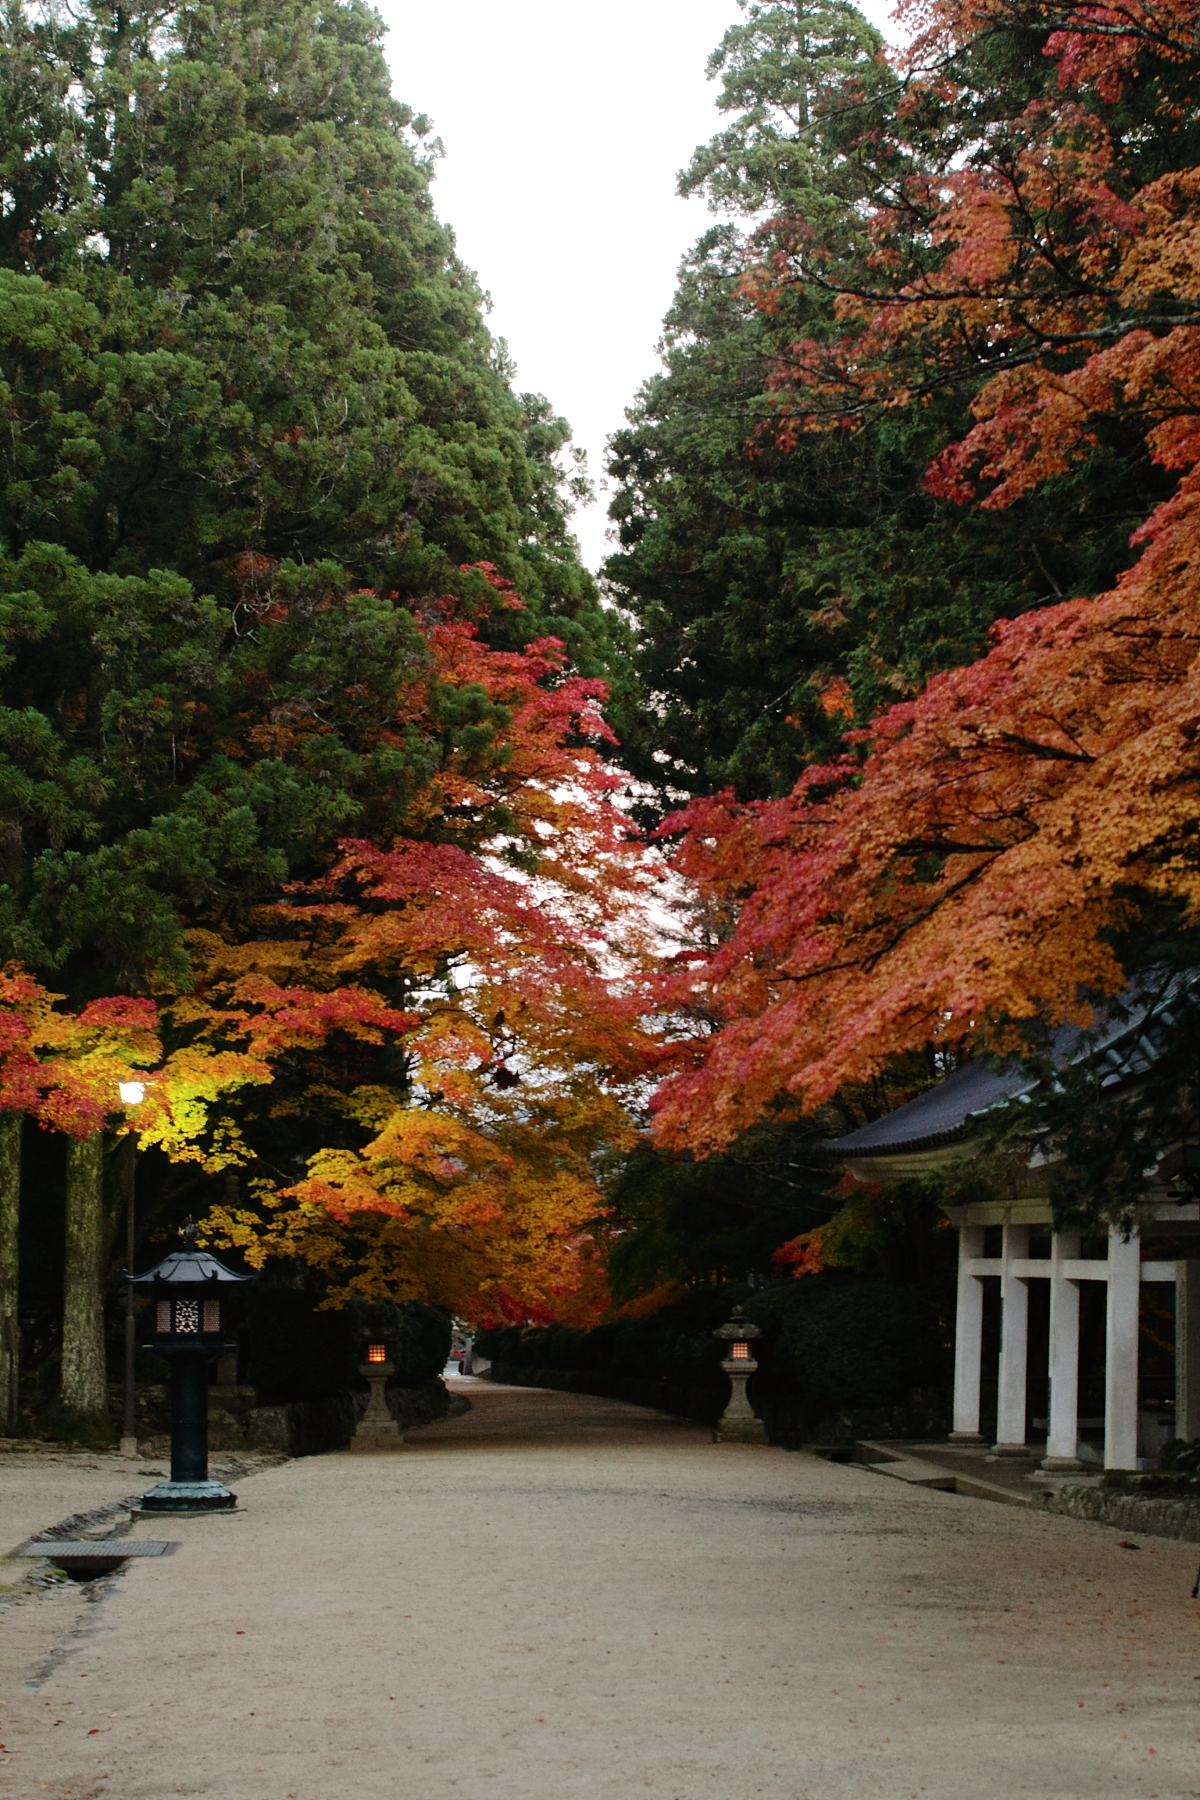 http://puni.nekomimi.jp/2010/11/12/101112-04.jpg